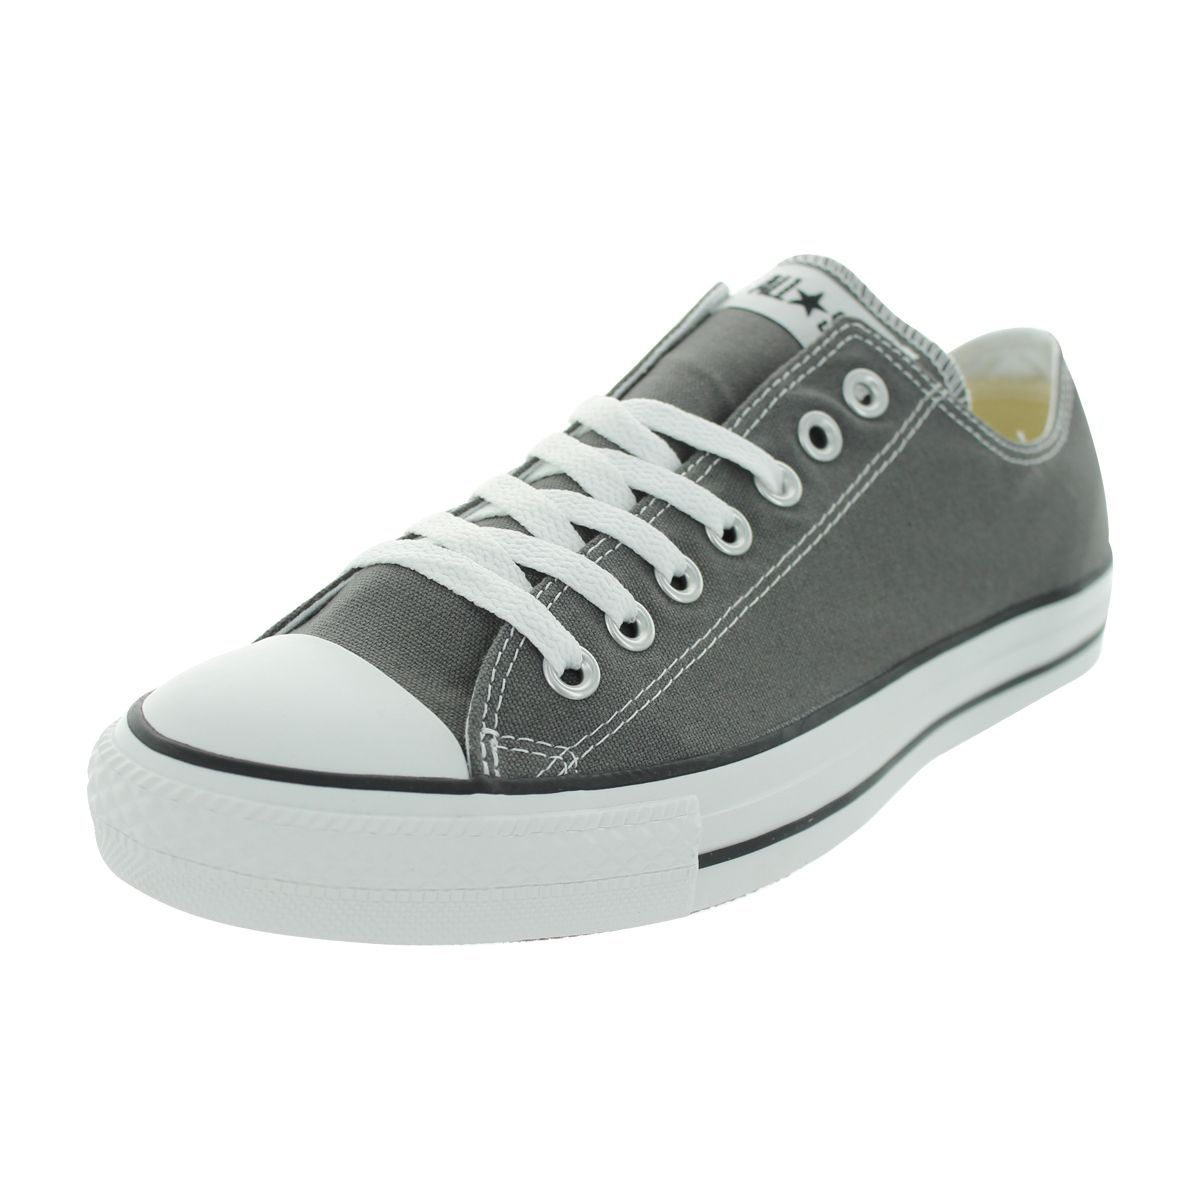 Converse Mens Chuck Taylor All Star Low Top Sneaker Charcoal M Canvas upper  Rubber toe cap Ox sneakers 353d00e2f